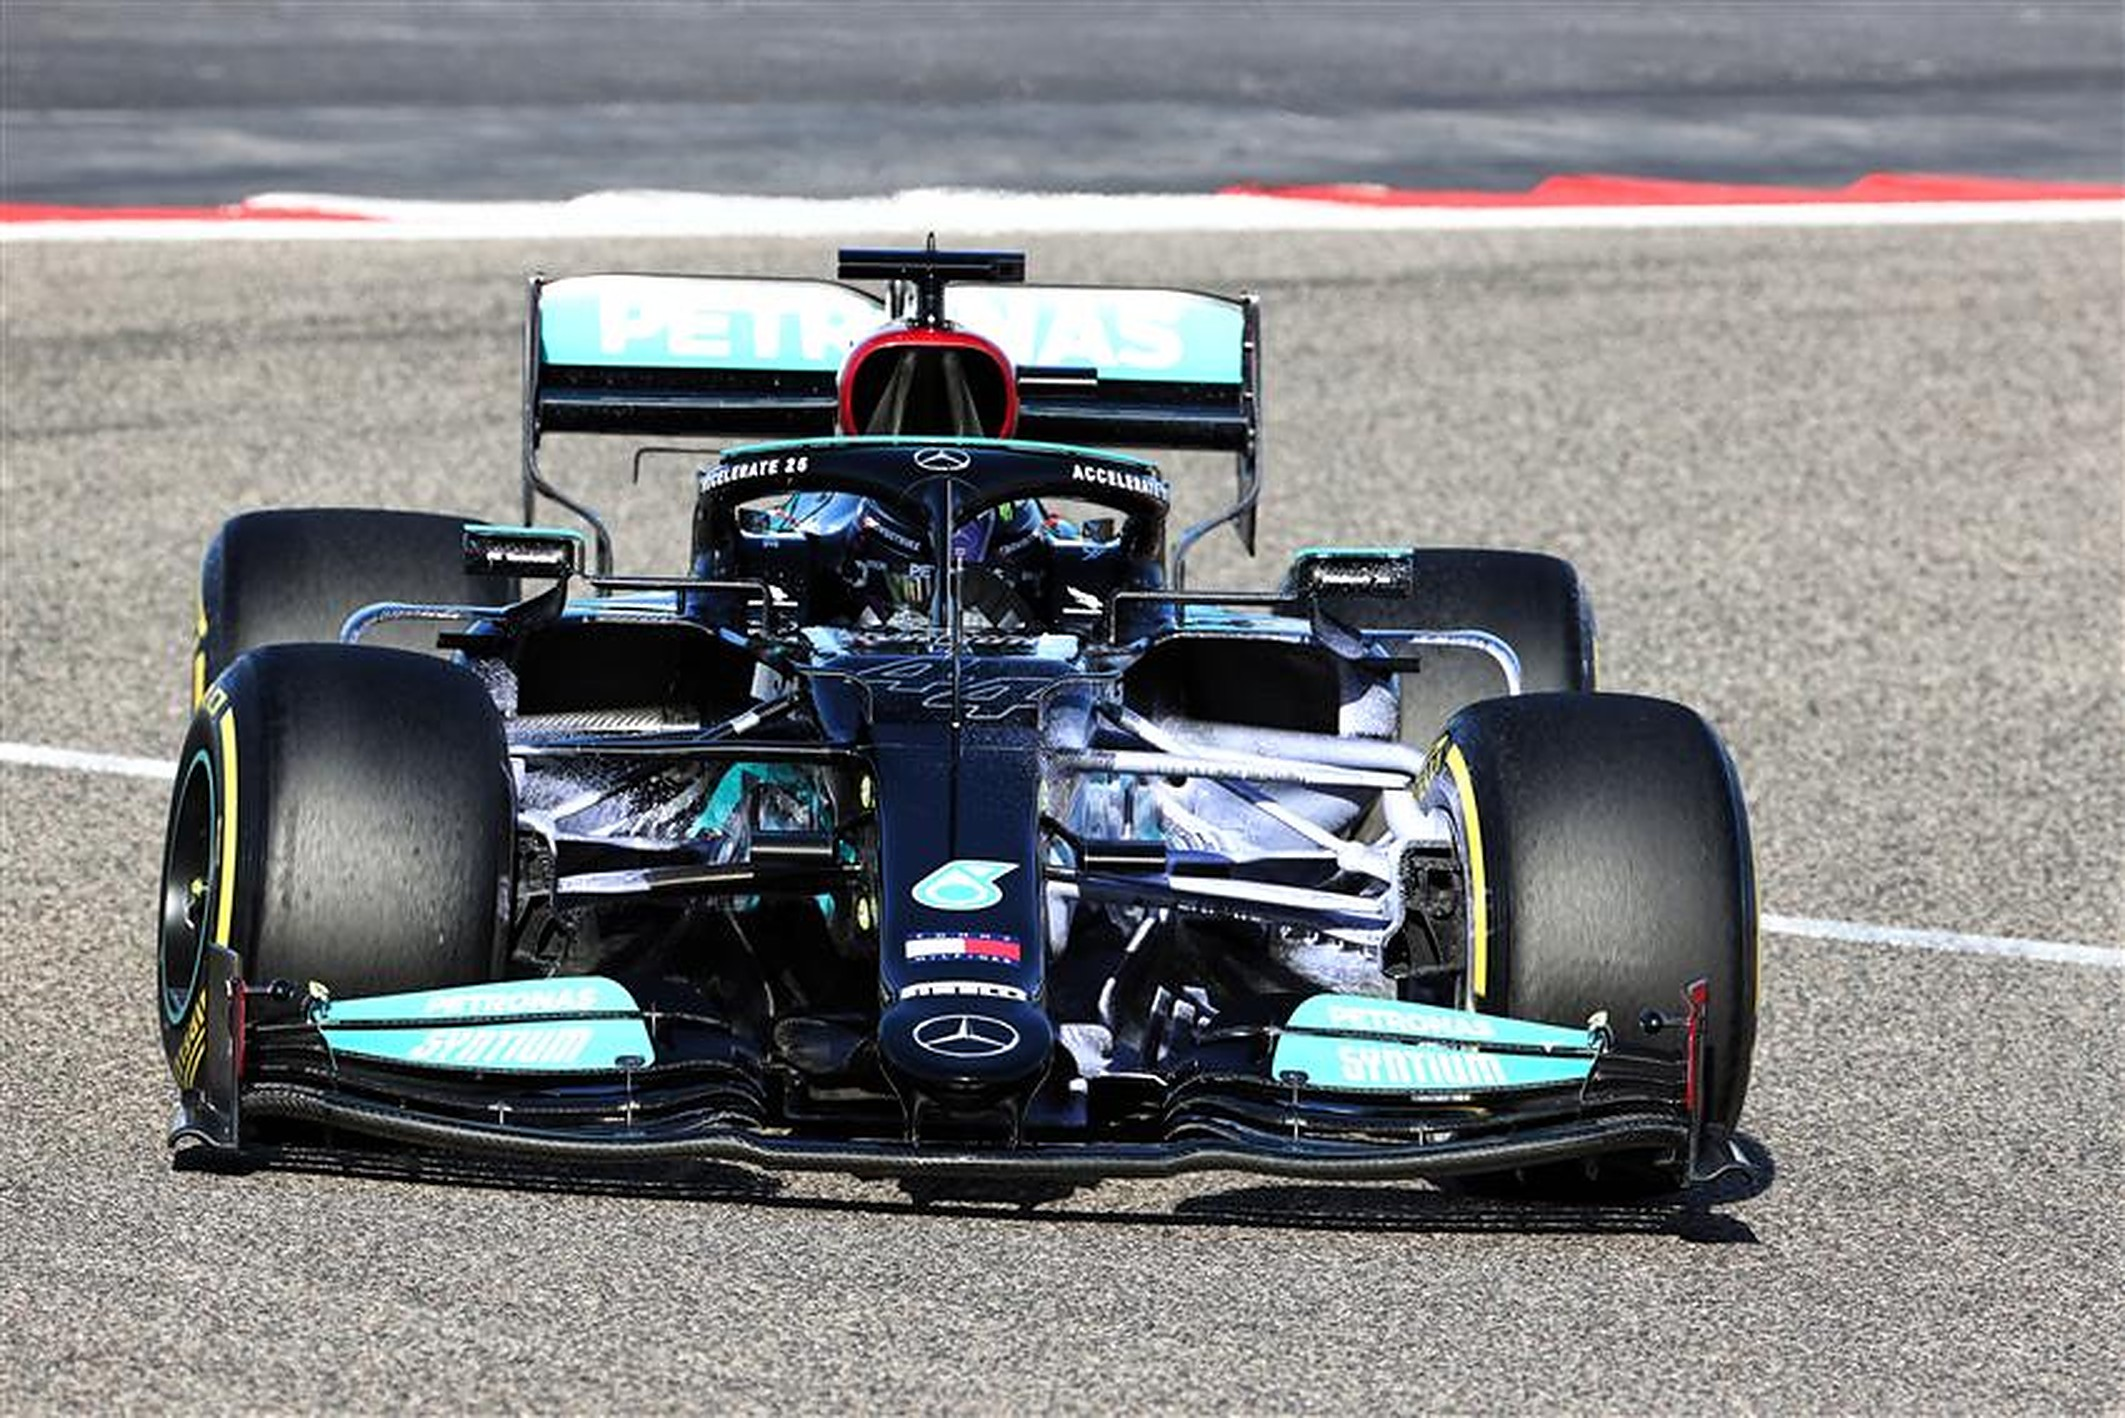 Mercedes W12 at Bahrain pre-season testing in 2021 - Formula1news.co.uk